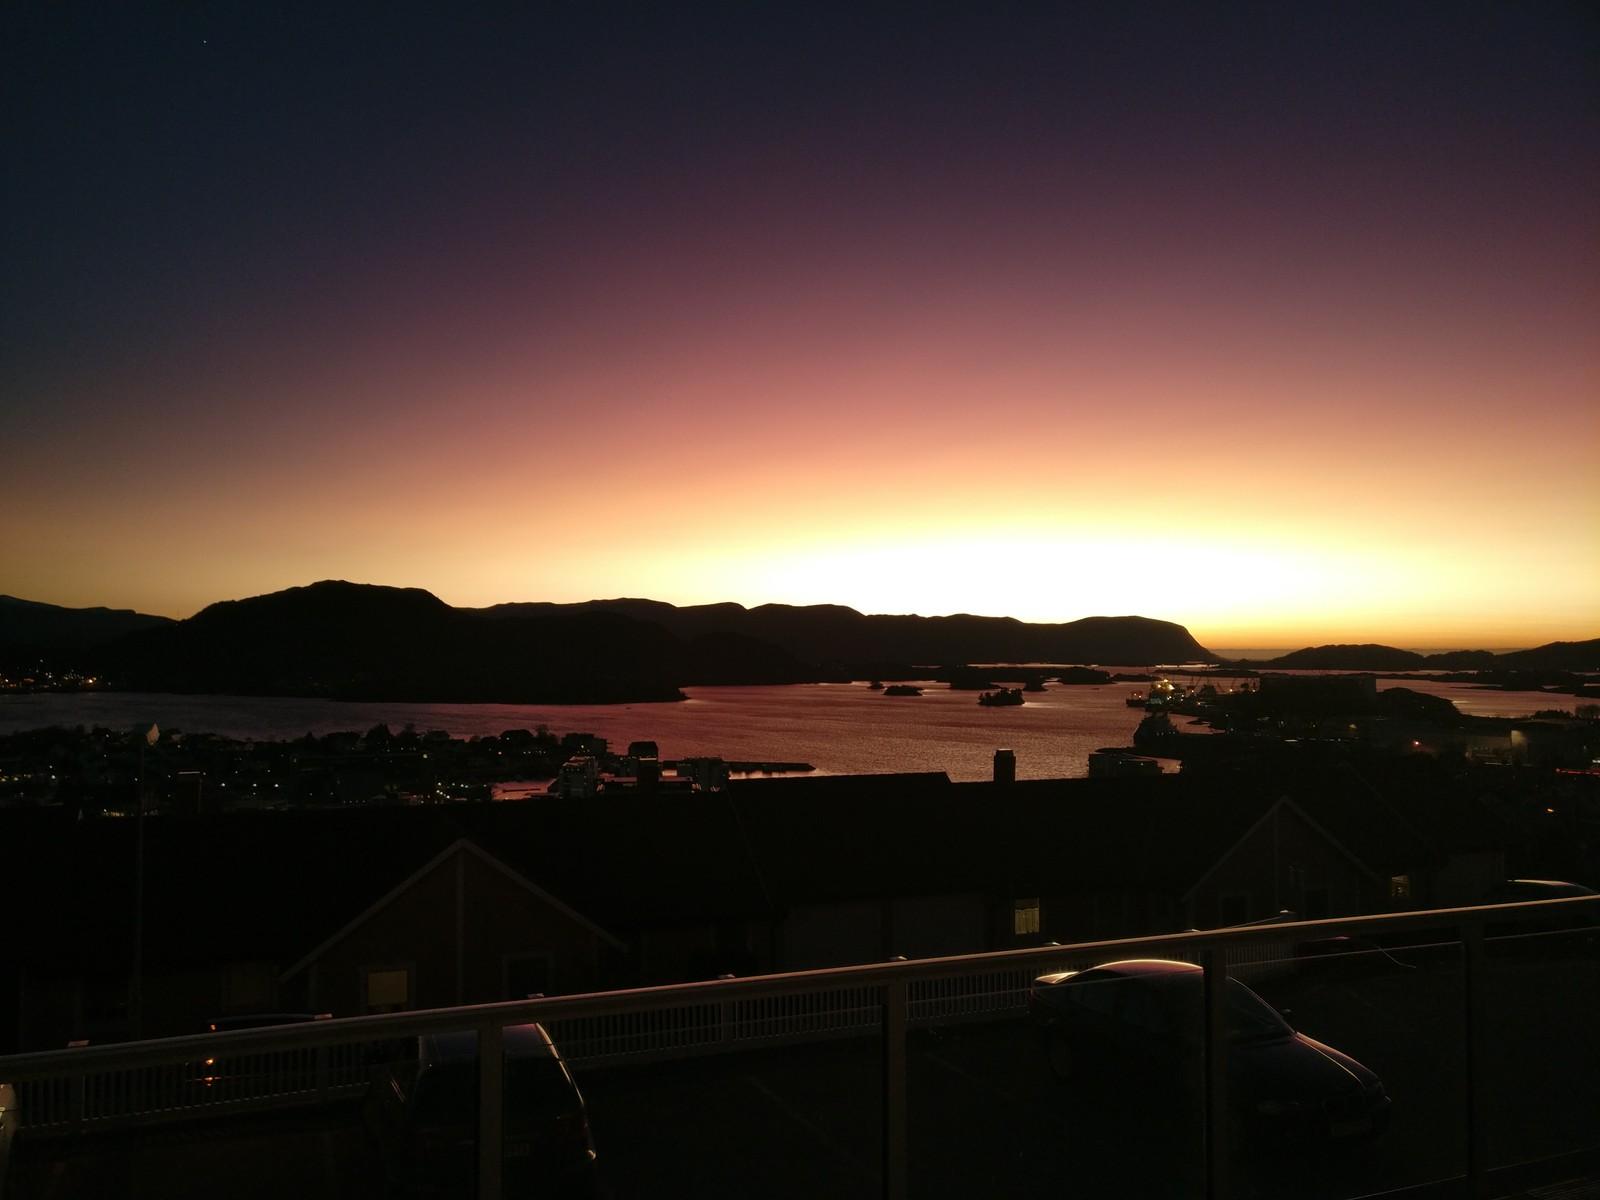 Solnedgang i Ulsteinvik